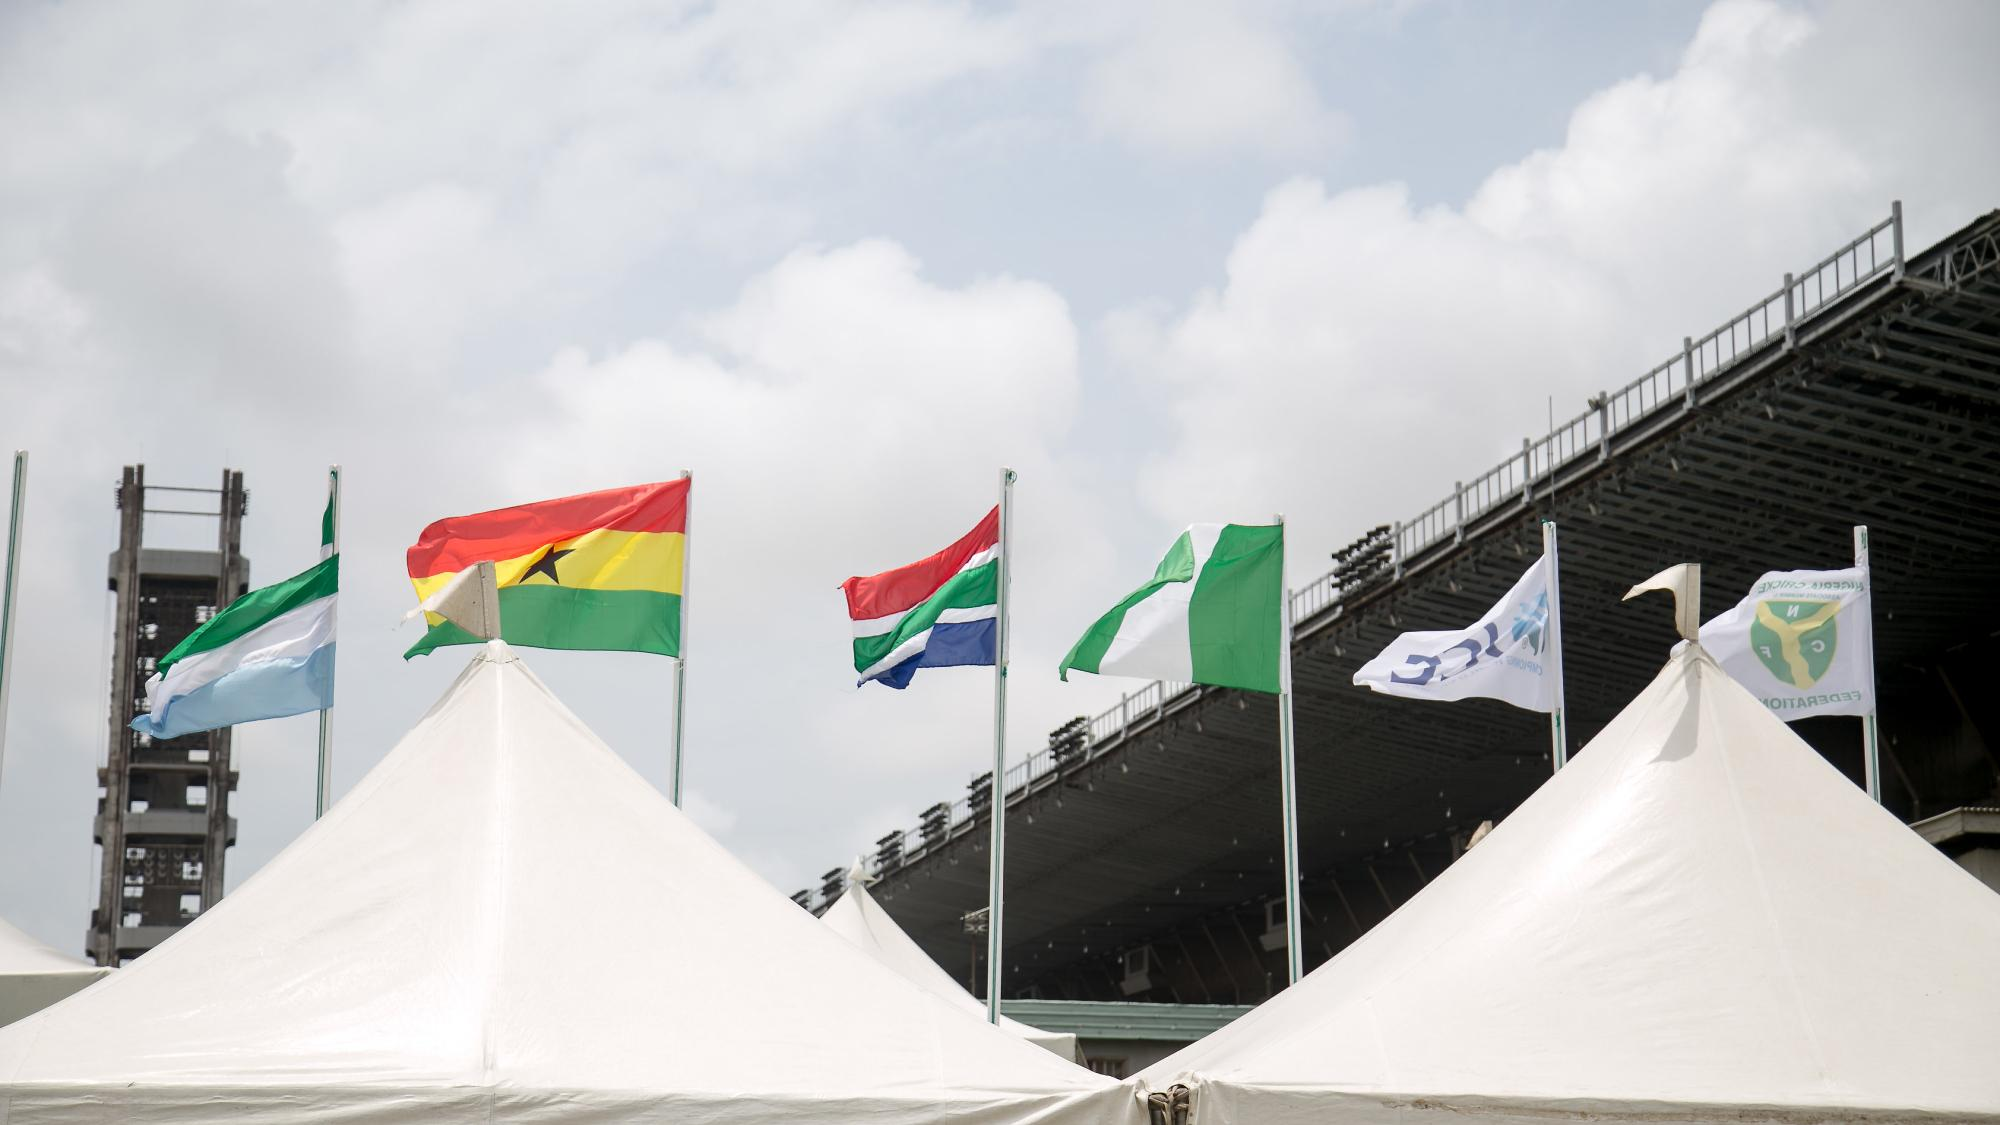 Flags flying in Lagos